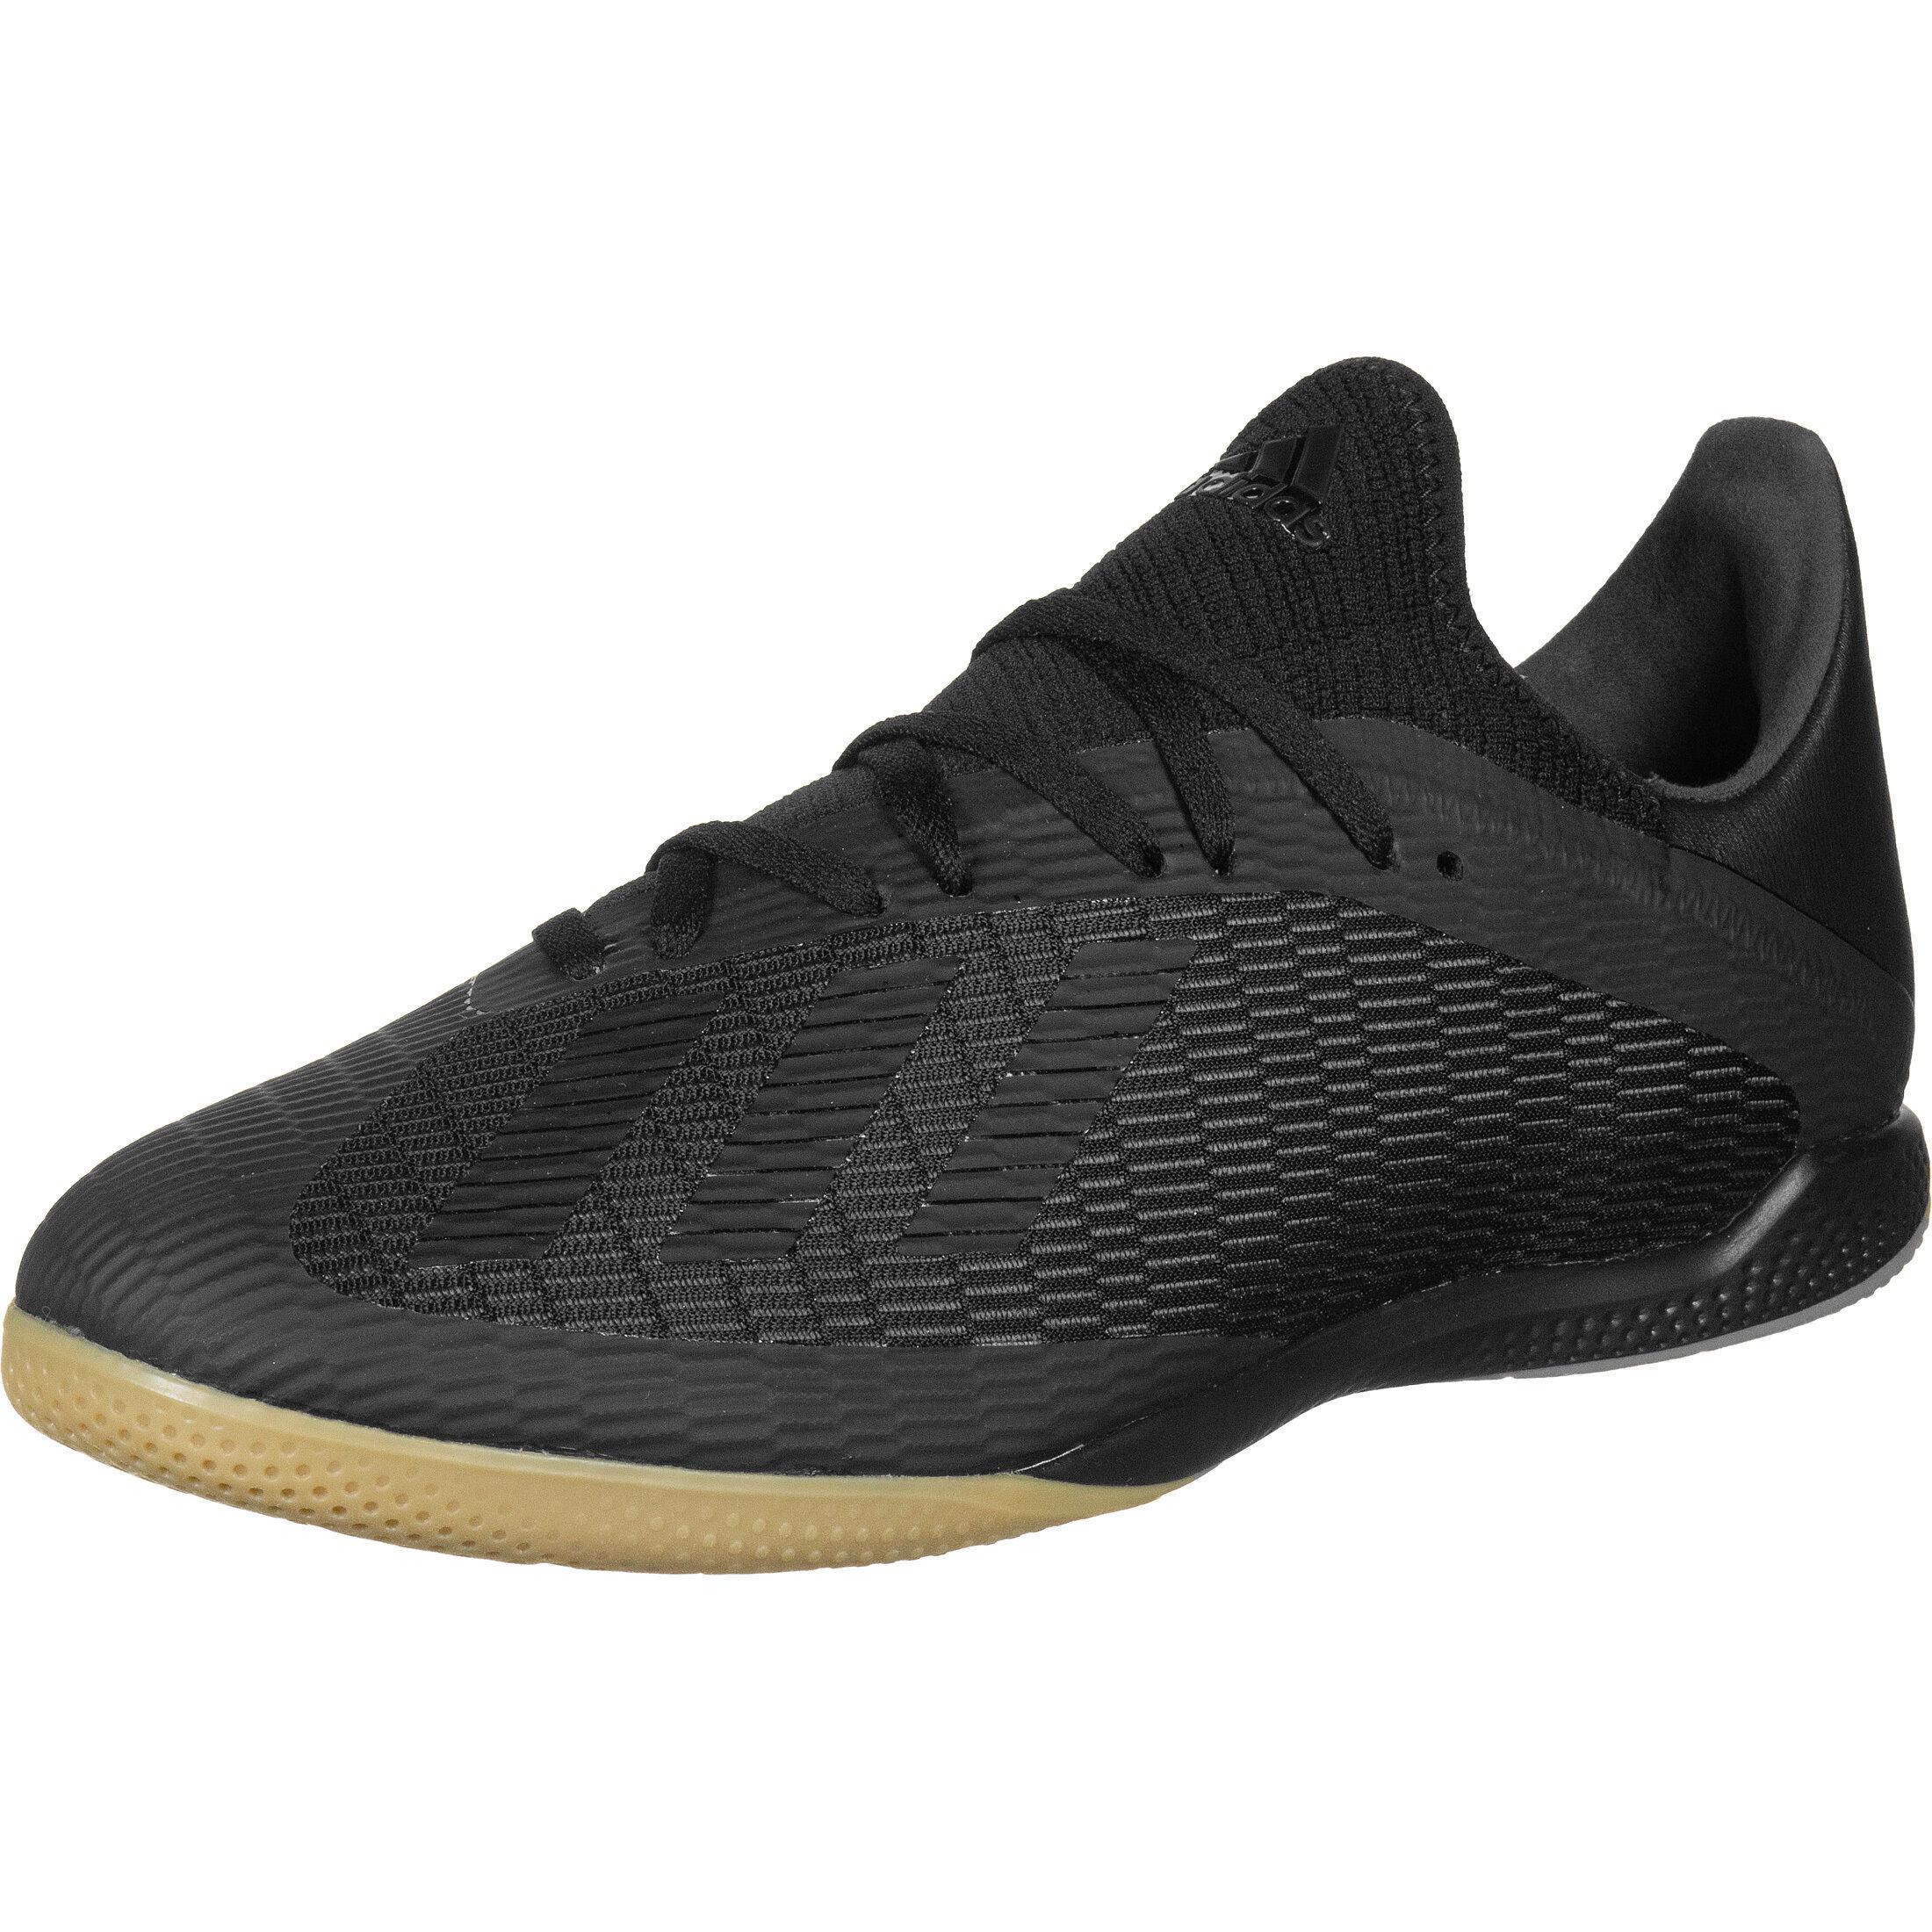 adidas Performance X 19.3 Indoor Fußballschuh Herren bei